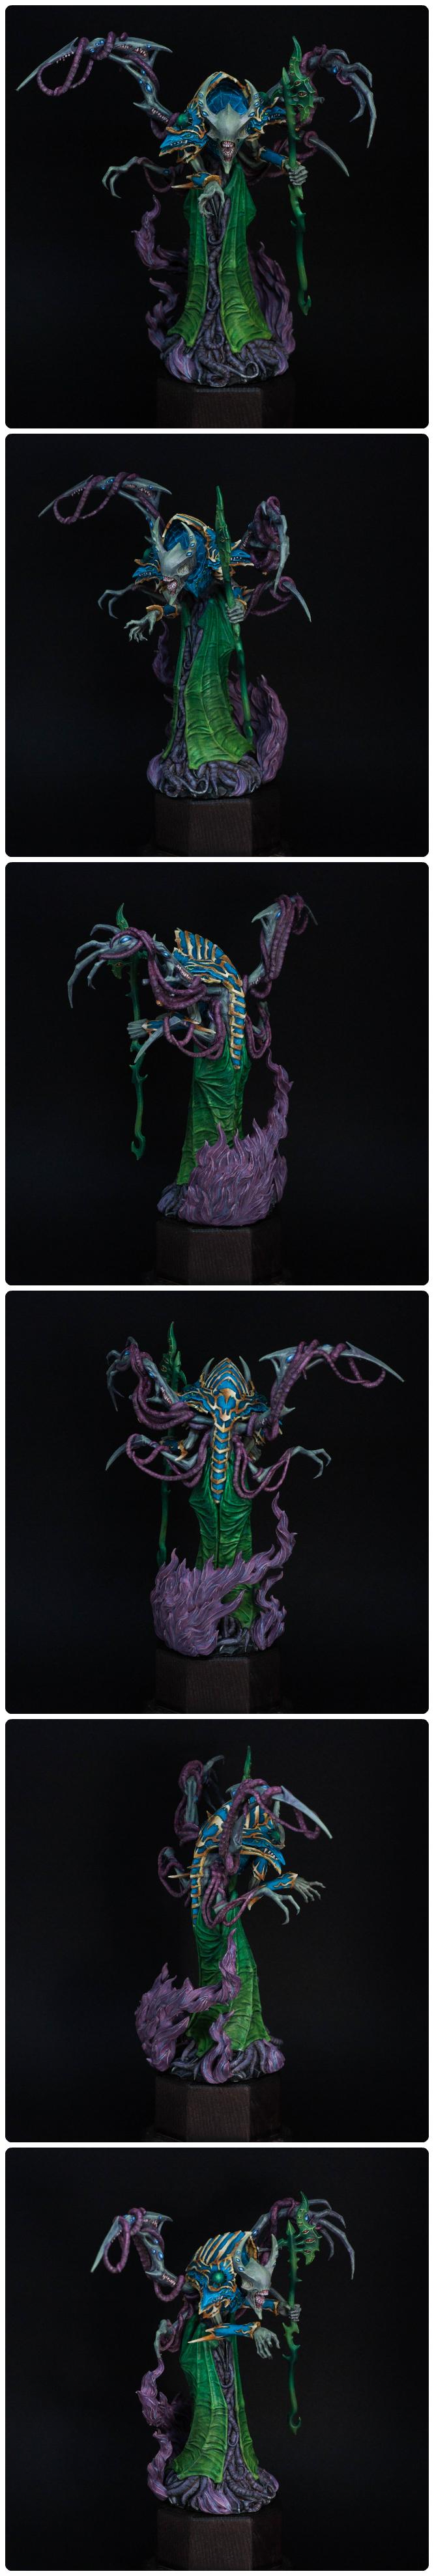 Lord of Metamorphis